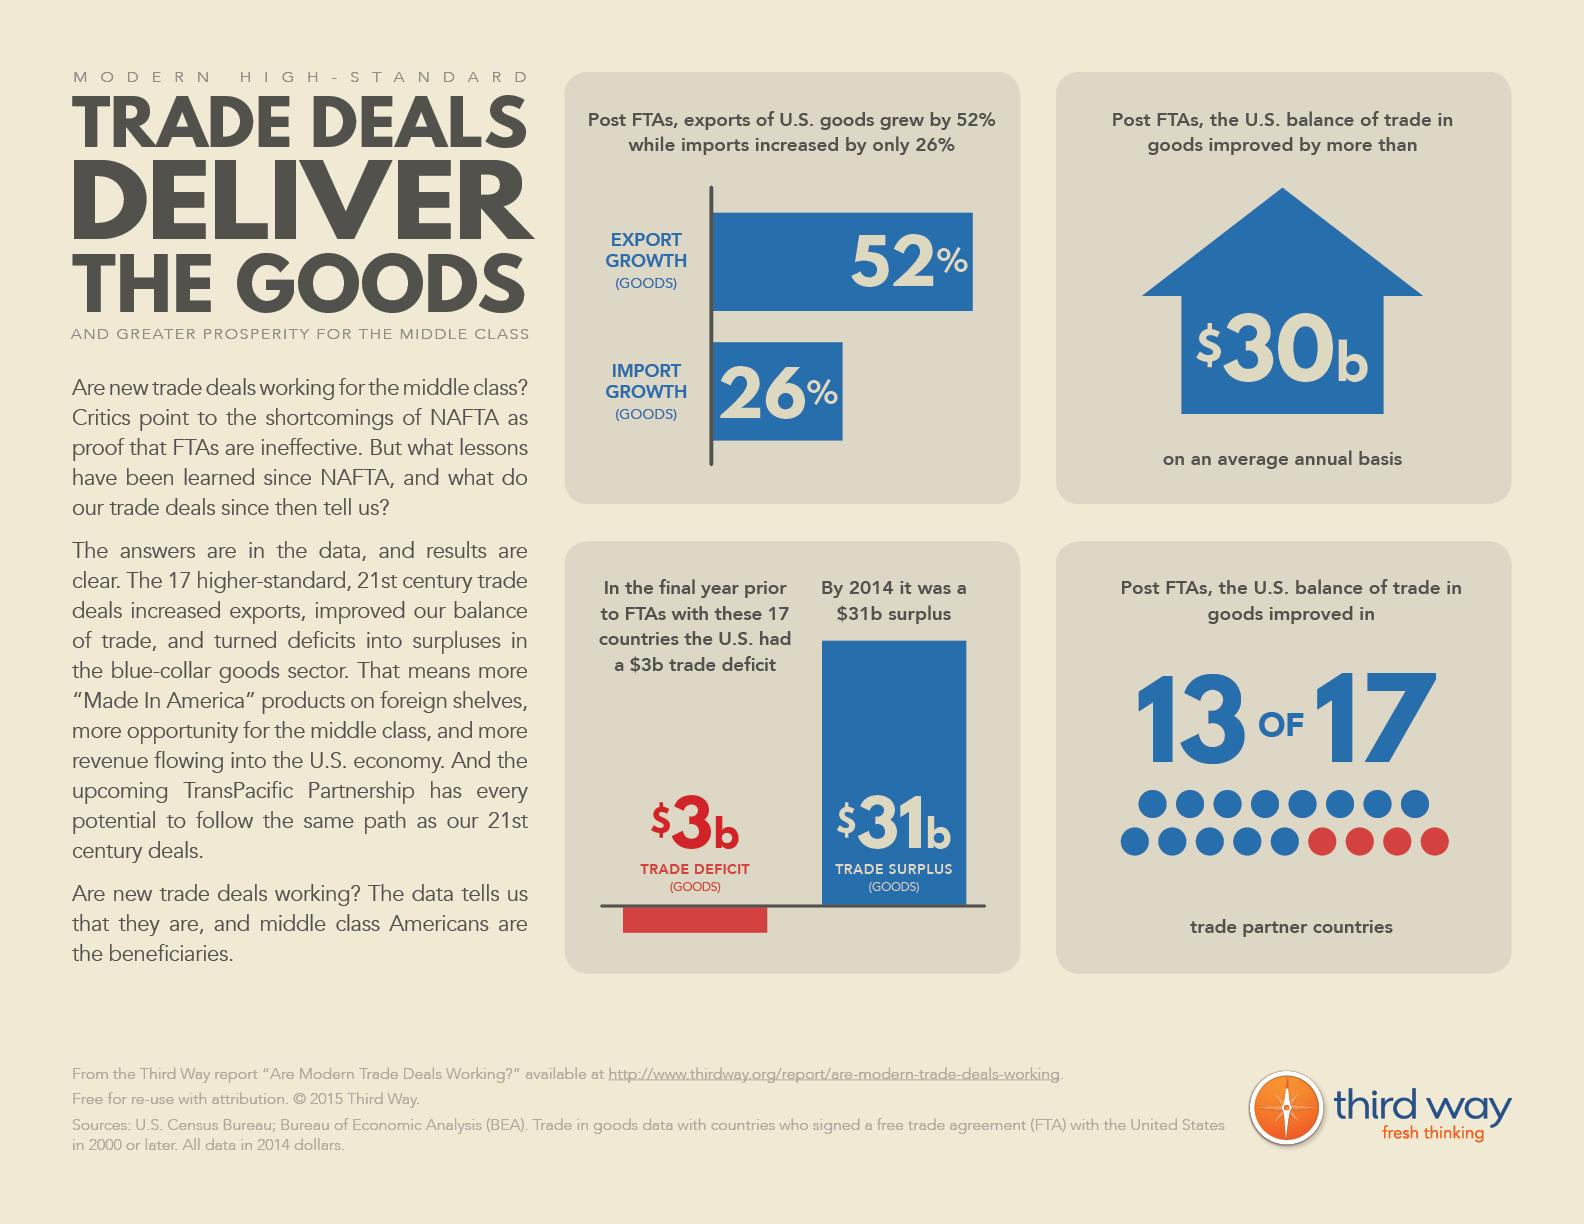 Trade Deals Deliver the Goods